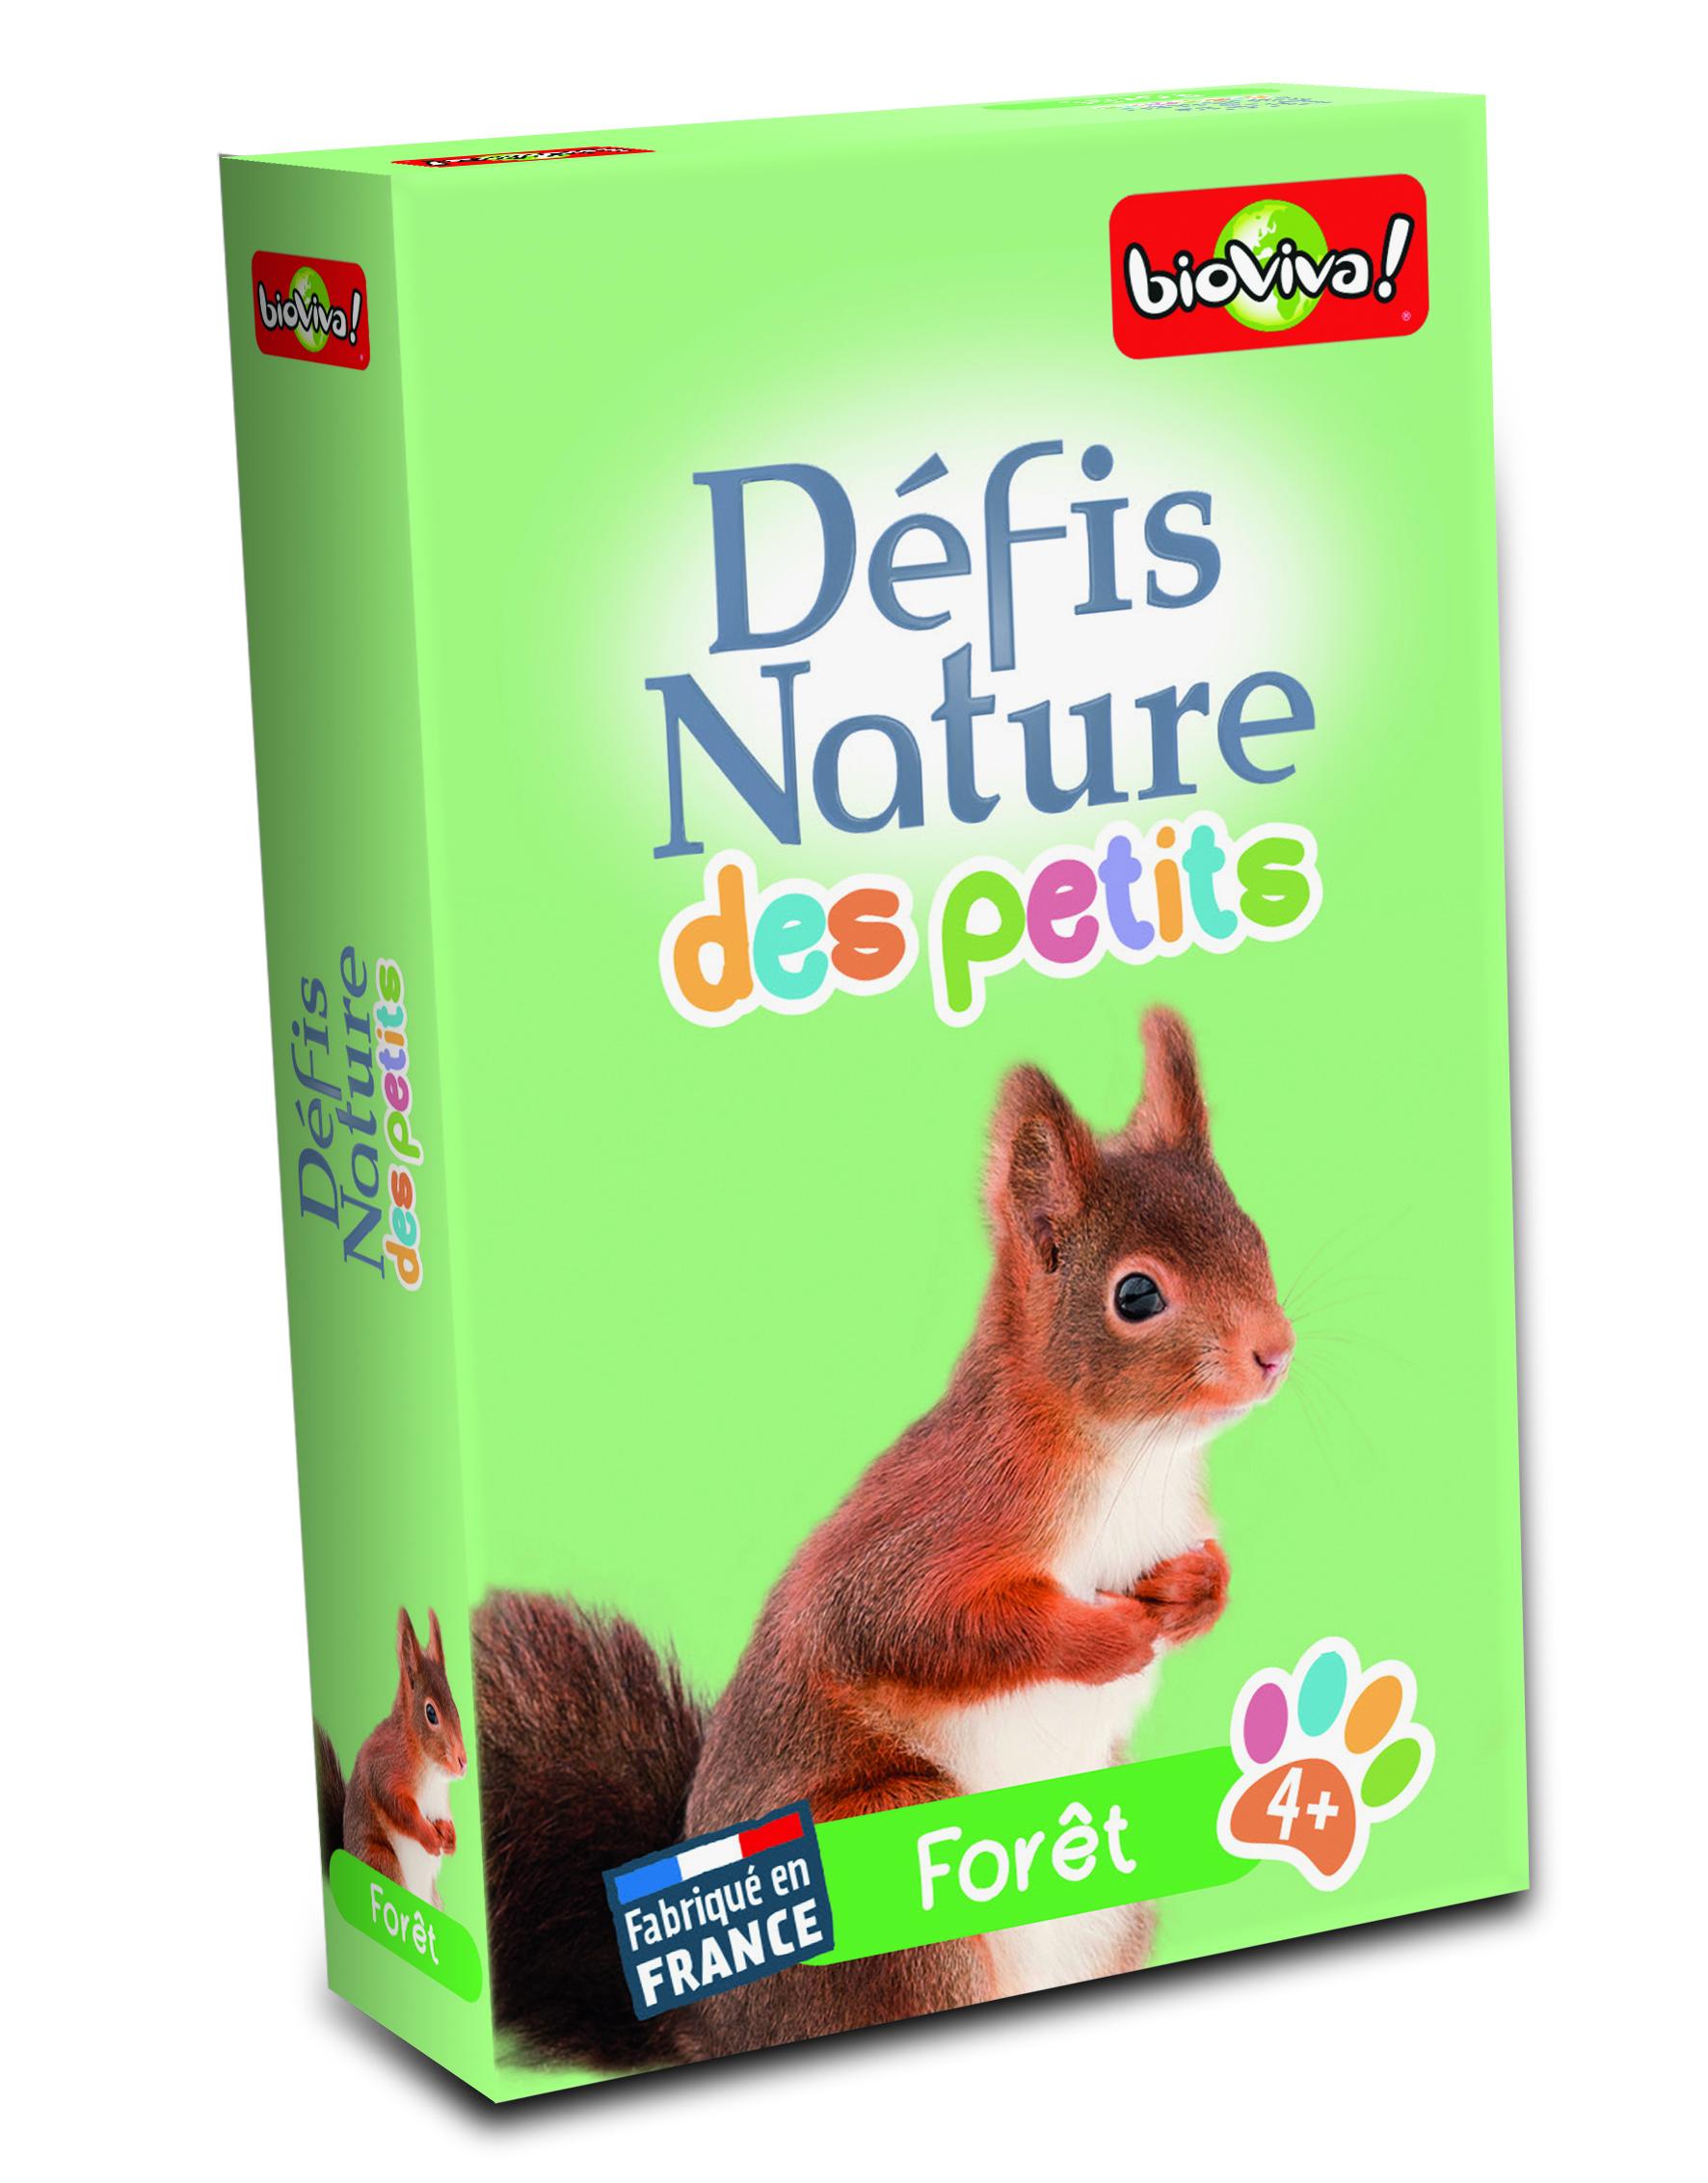 Defis Nature des Petits-Foret-Bioviva-Couv-Jeu de societe-ludovox